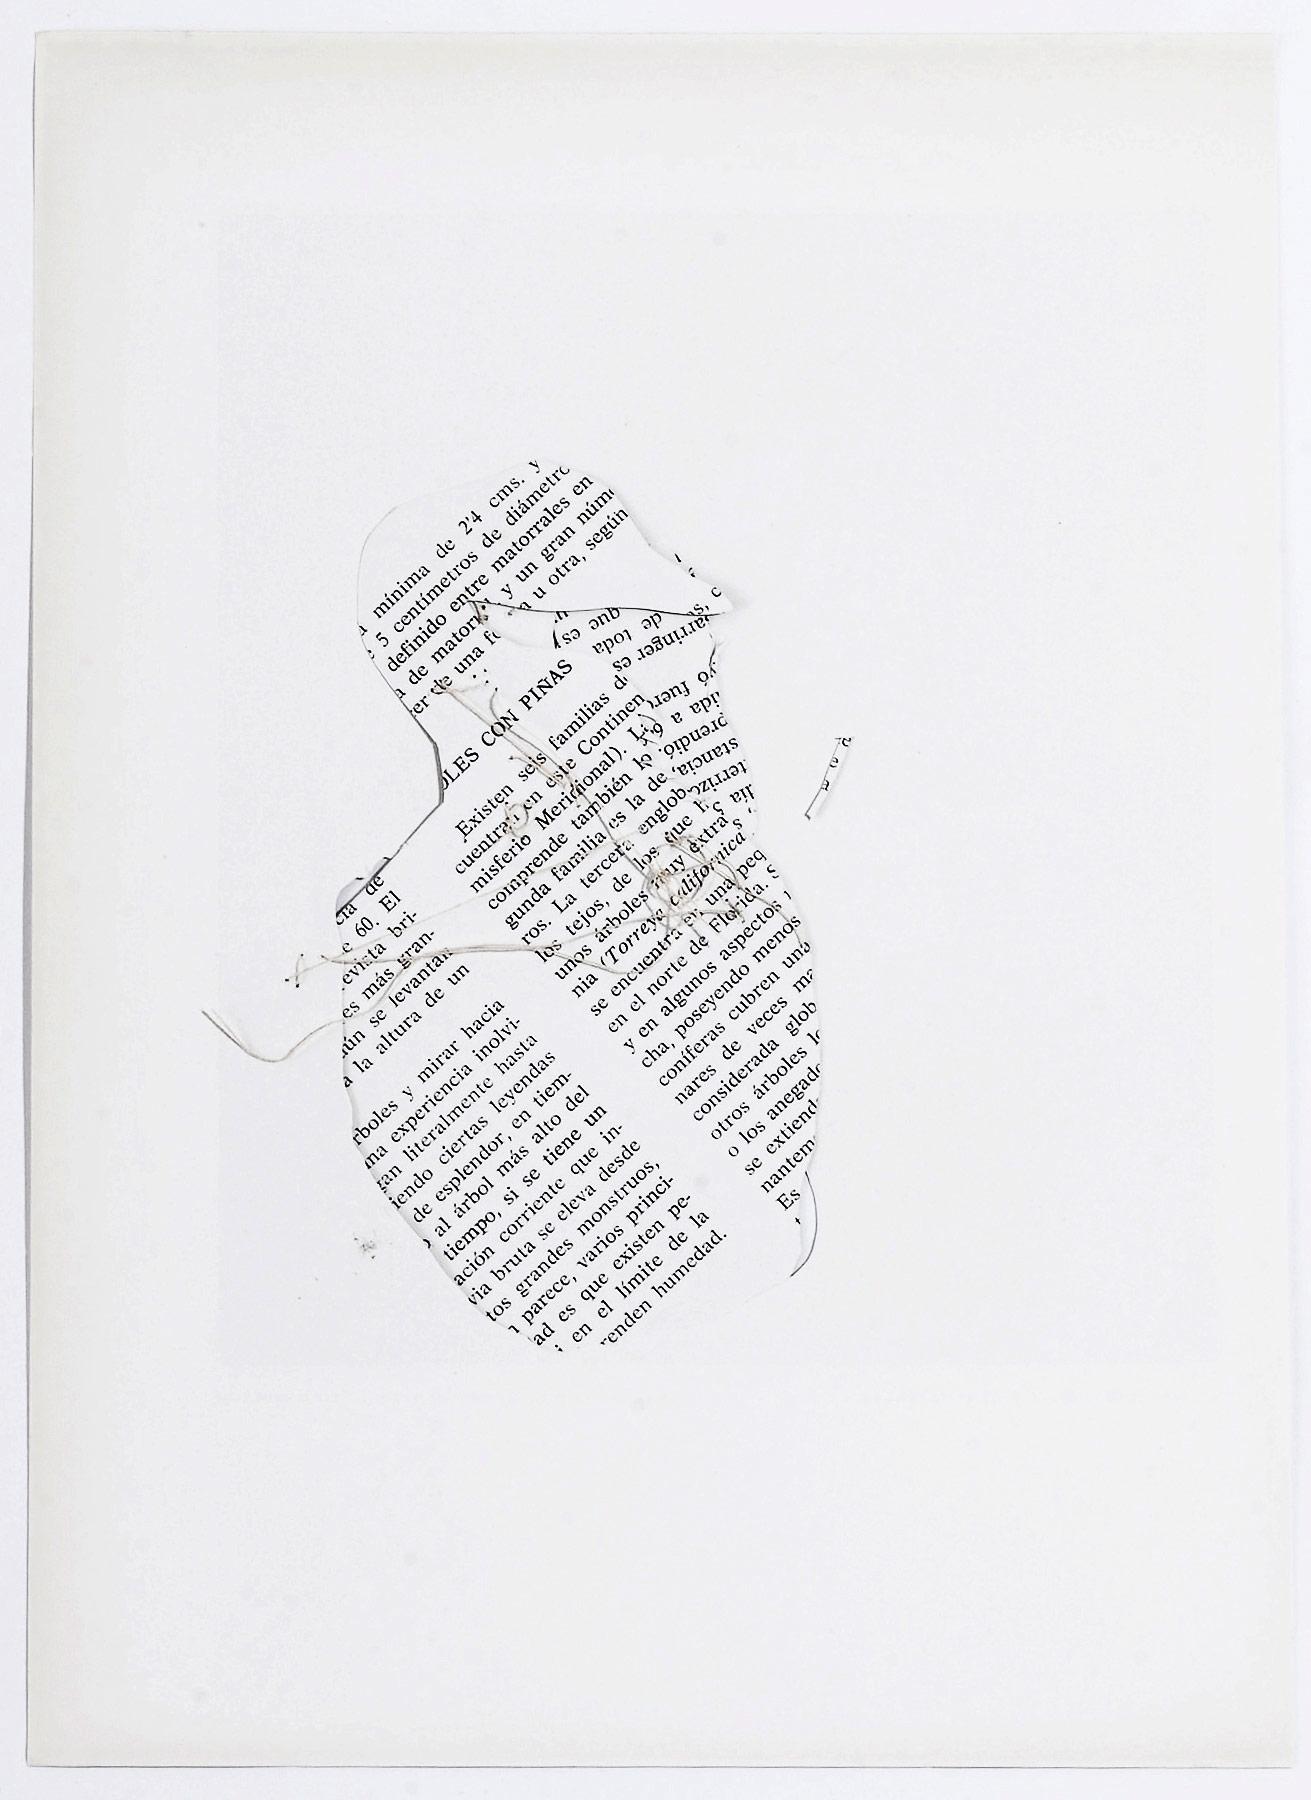 Collage#27, 2010. (Dorso). Collage,papel, hilo. 25 x 19,5 cm.